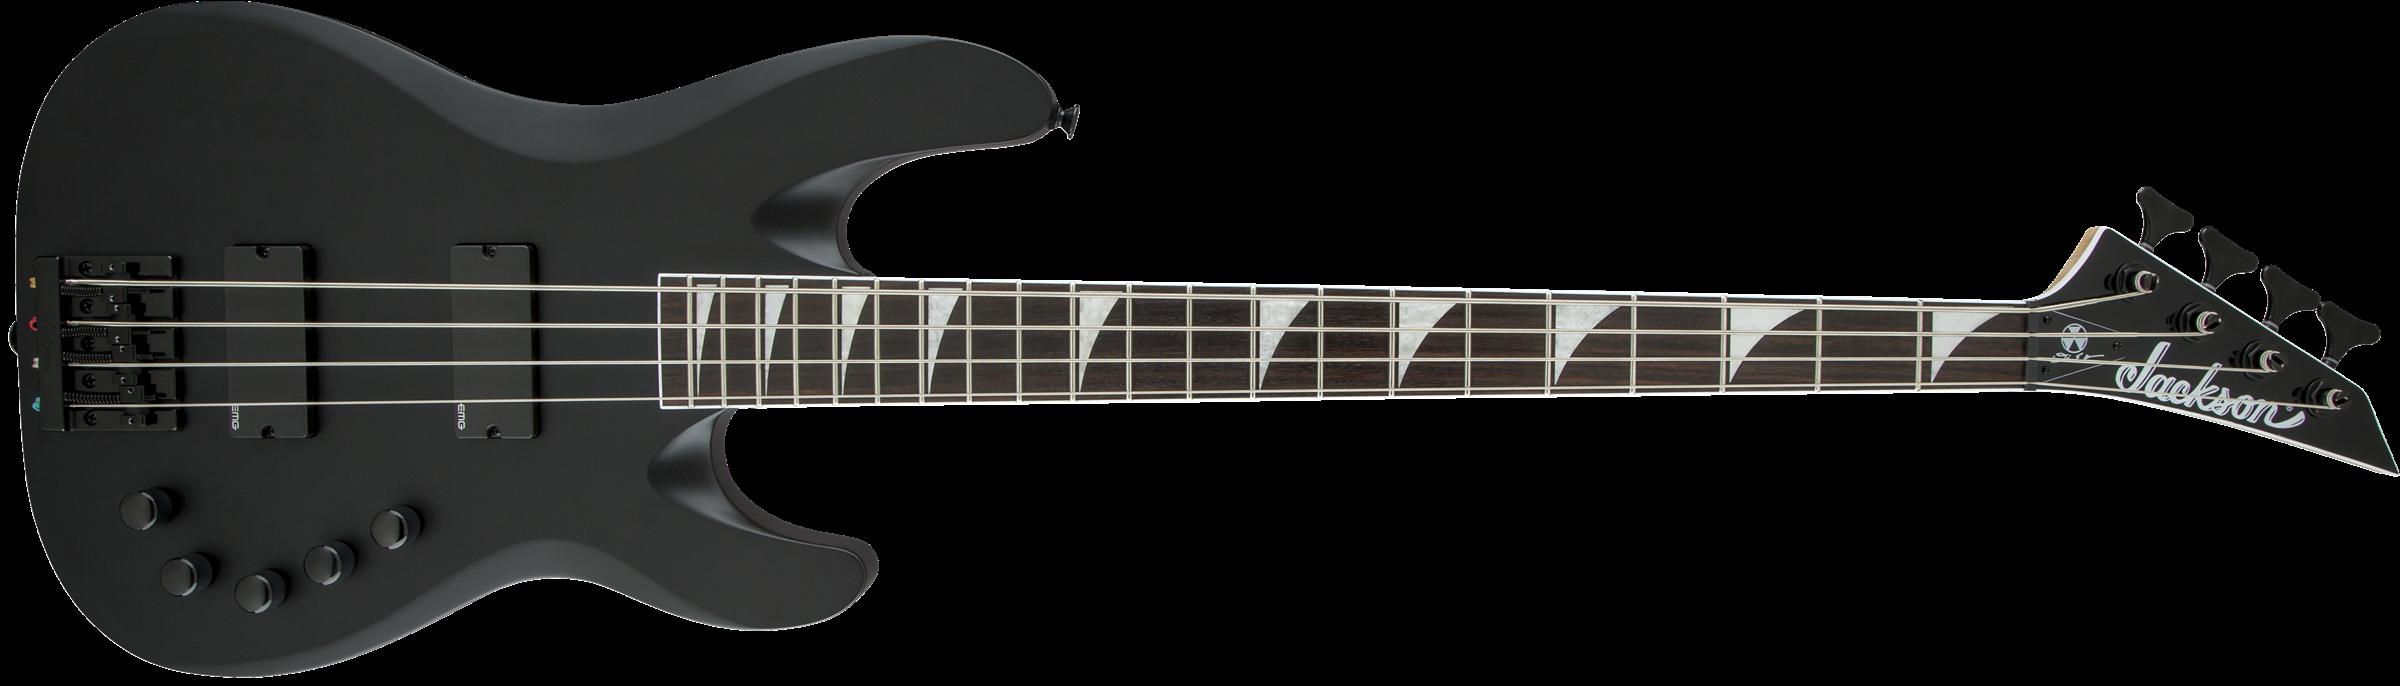 Jackson X Series Signature David Ellefson Concert™ Bass CBX IV, Laurel Fingerboard, Satin Black